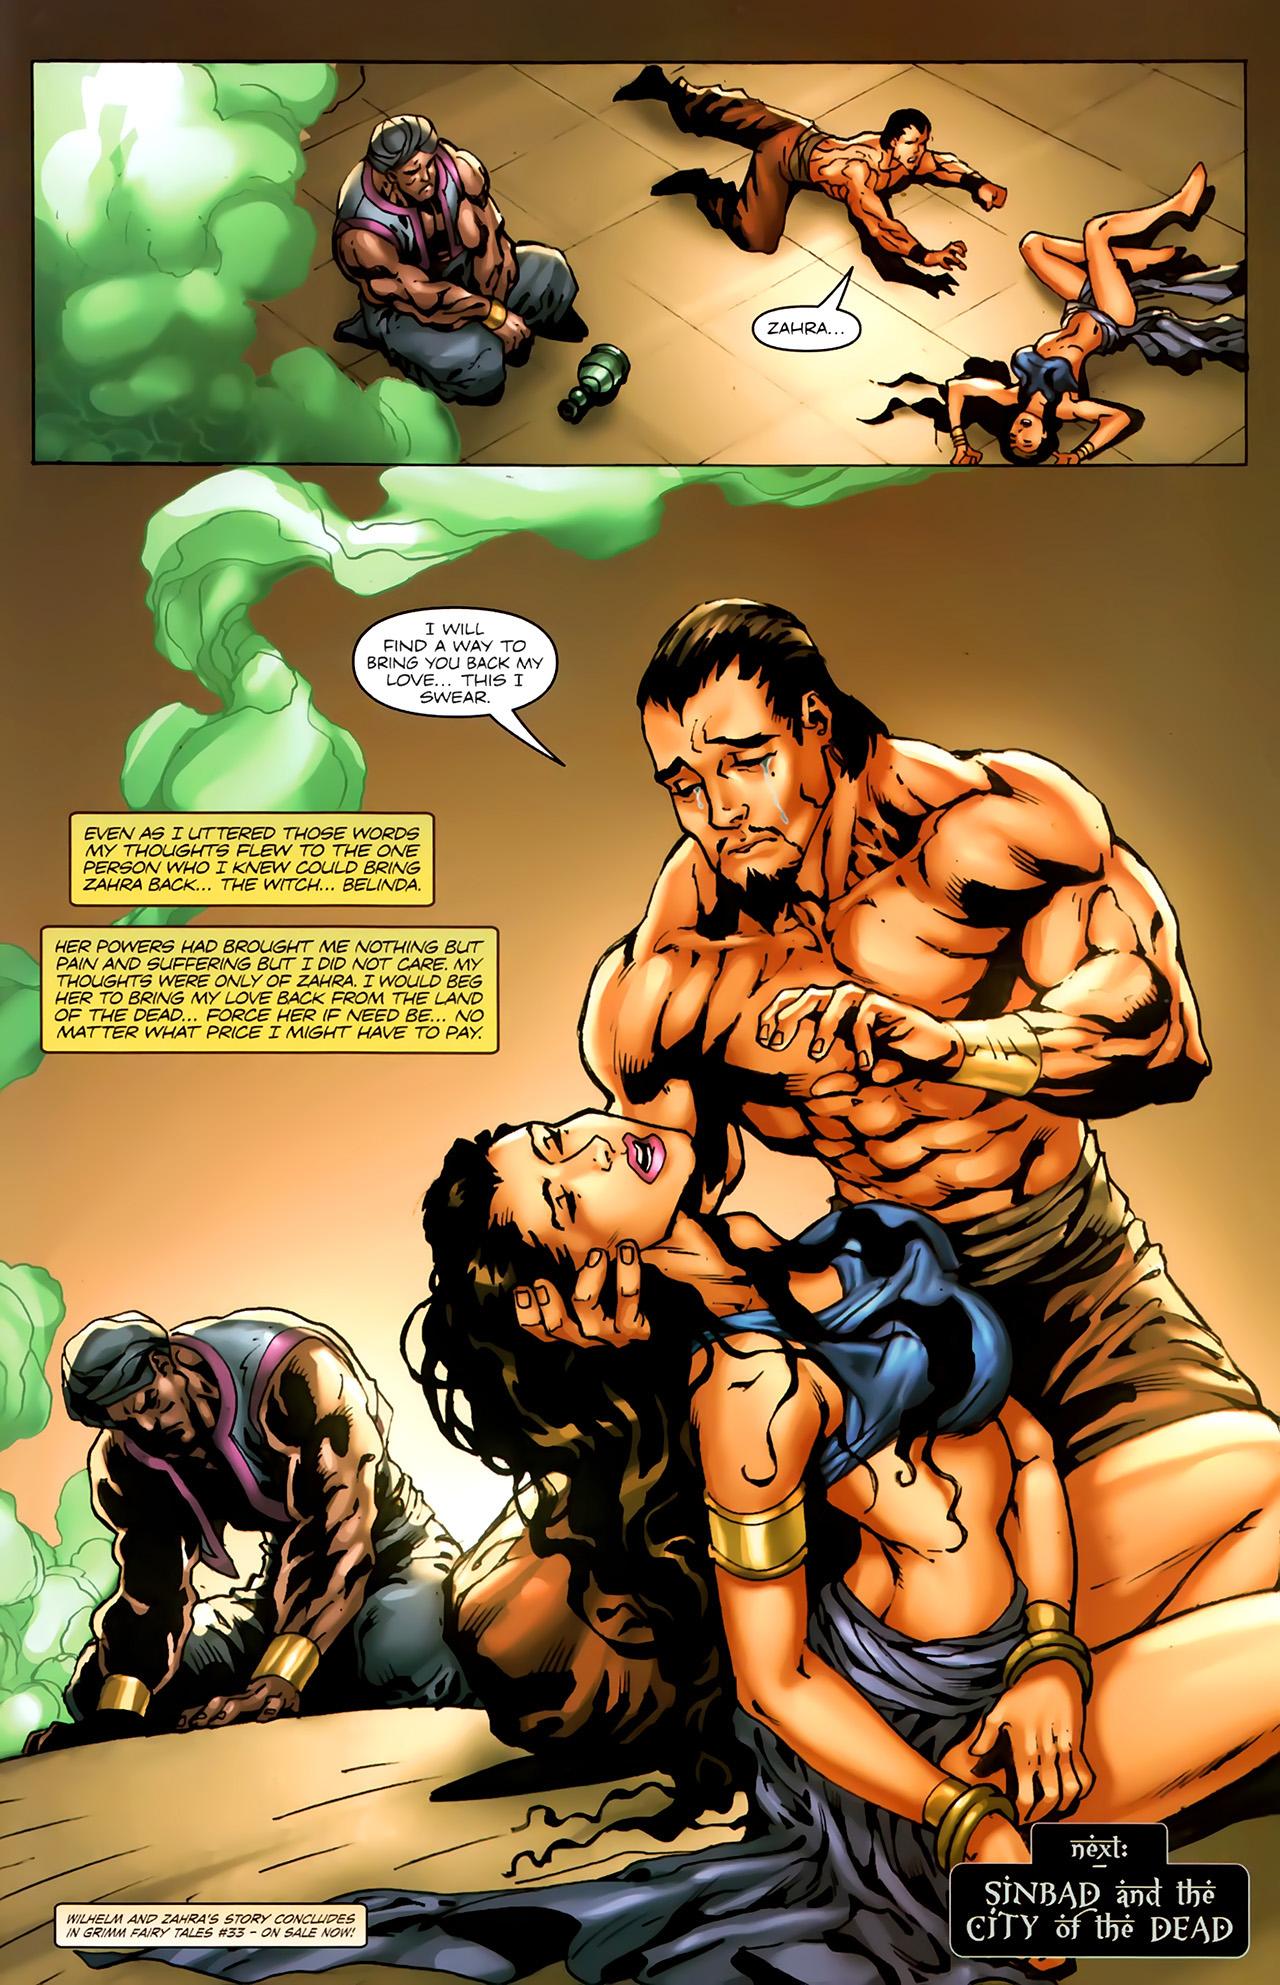 Read online 1001 Arabian Nights: The Adventures of Sinbad comic -  Issue #7 - 23